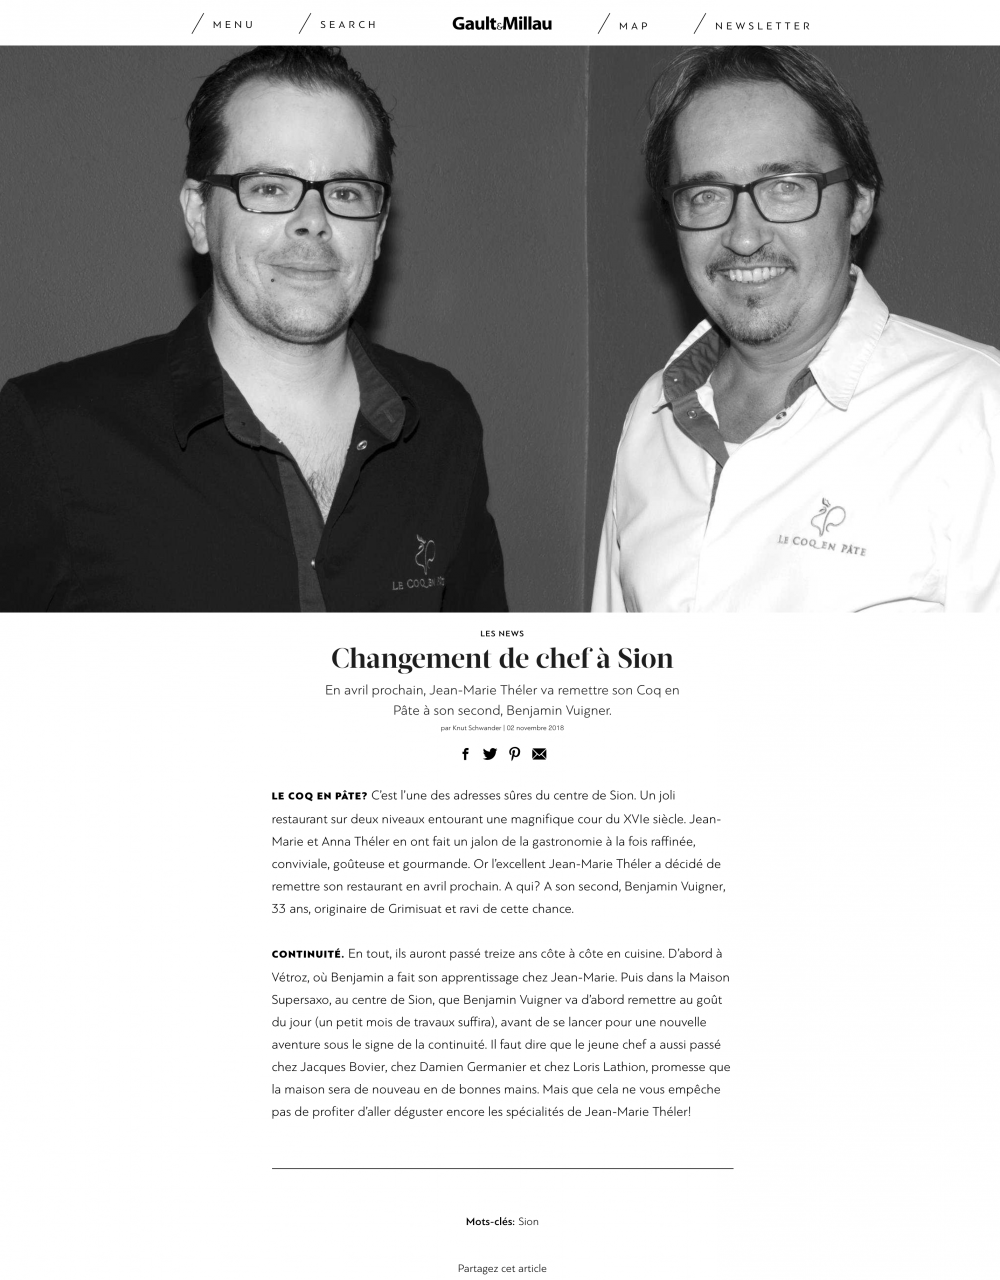 fireshot-capture-080-changement-de-chef-a-sion-gaultmillau–channel-www.gaultmillau.ch_